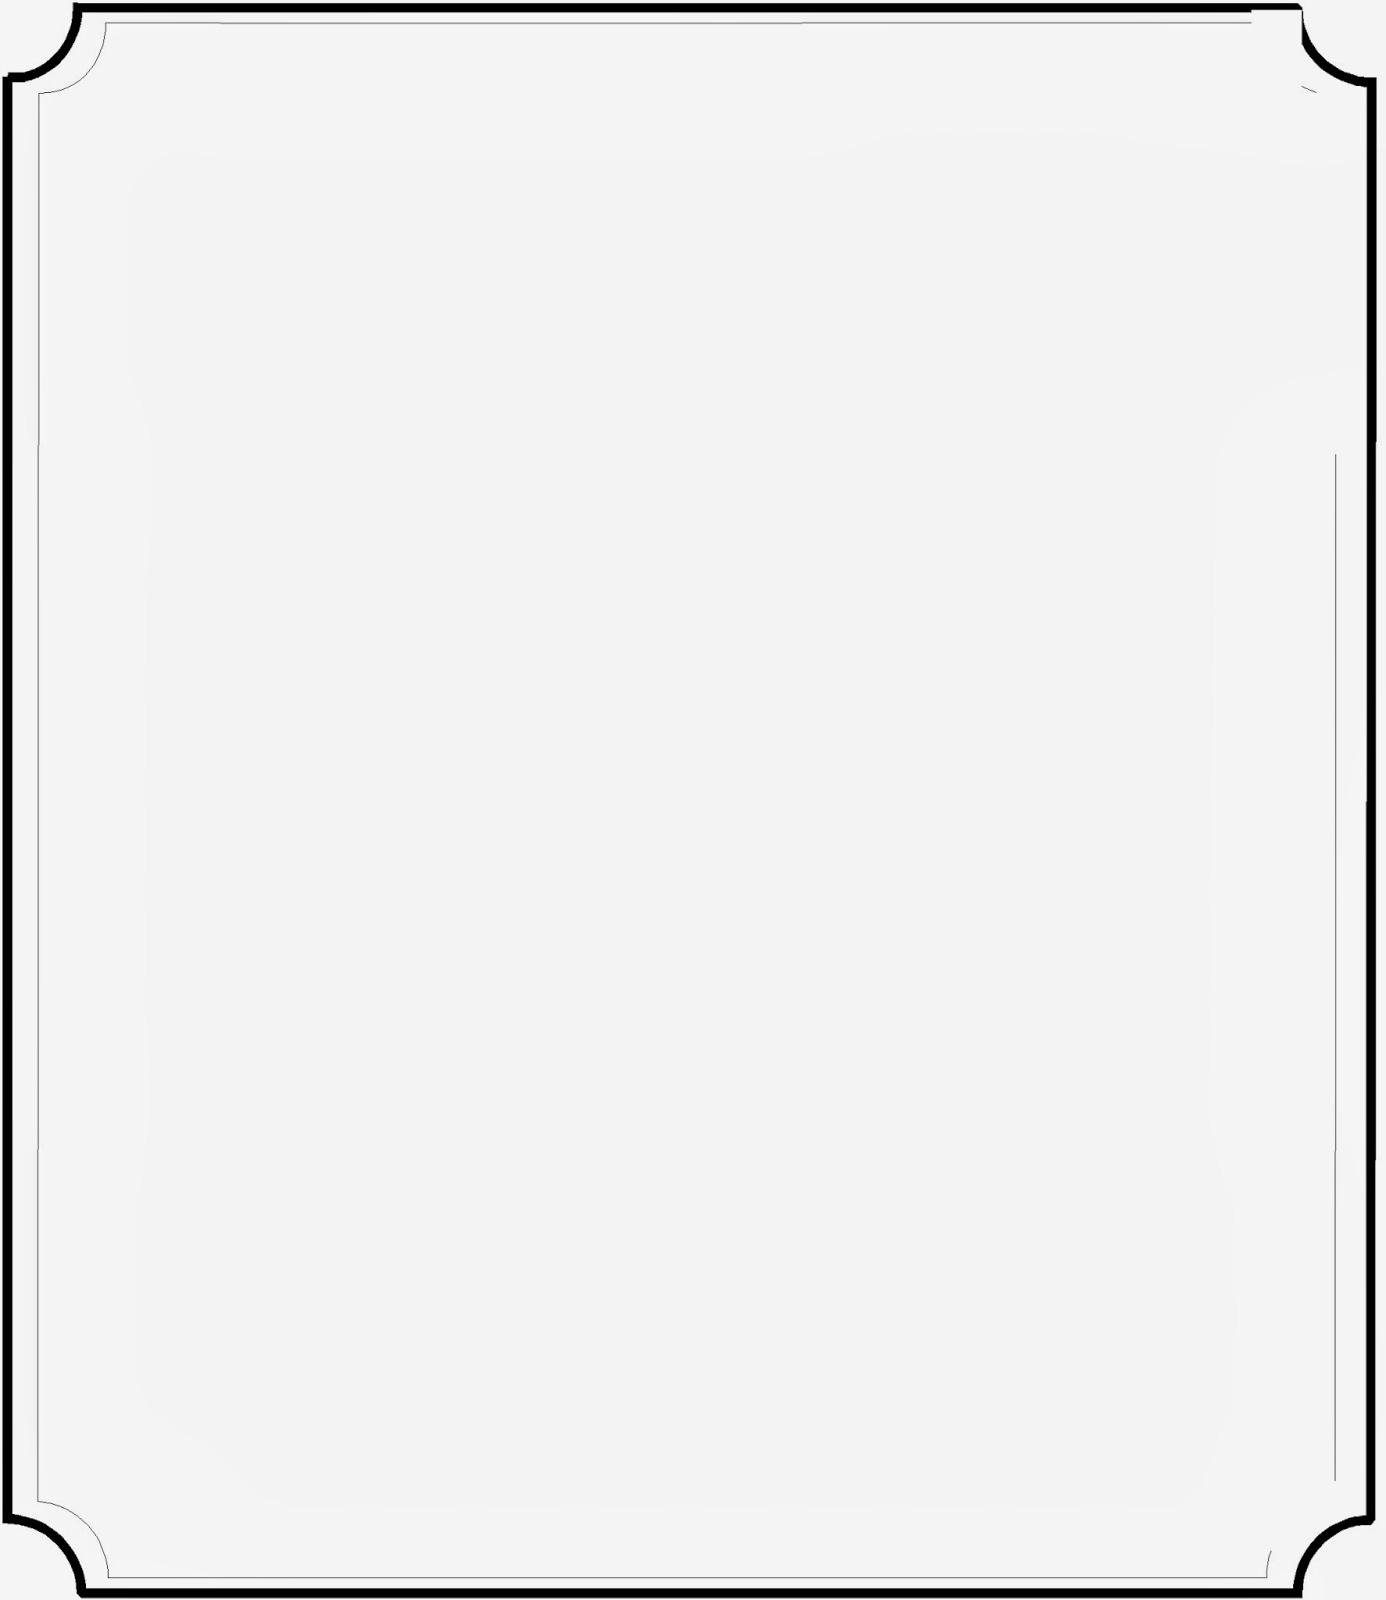 Line Art Borders : Best collection store page border line art black white